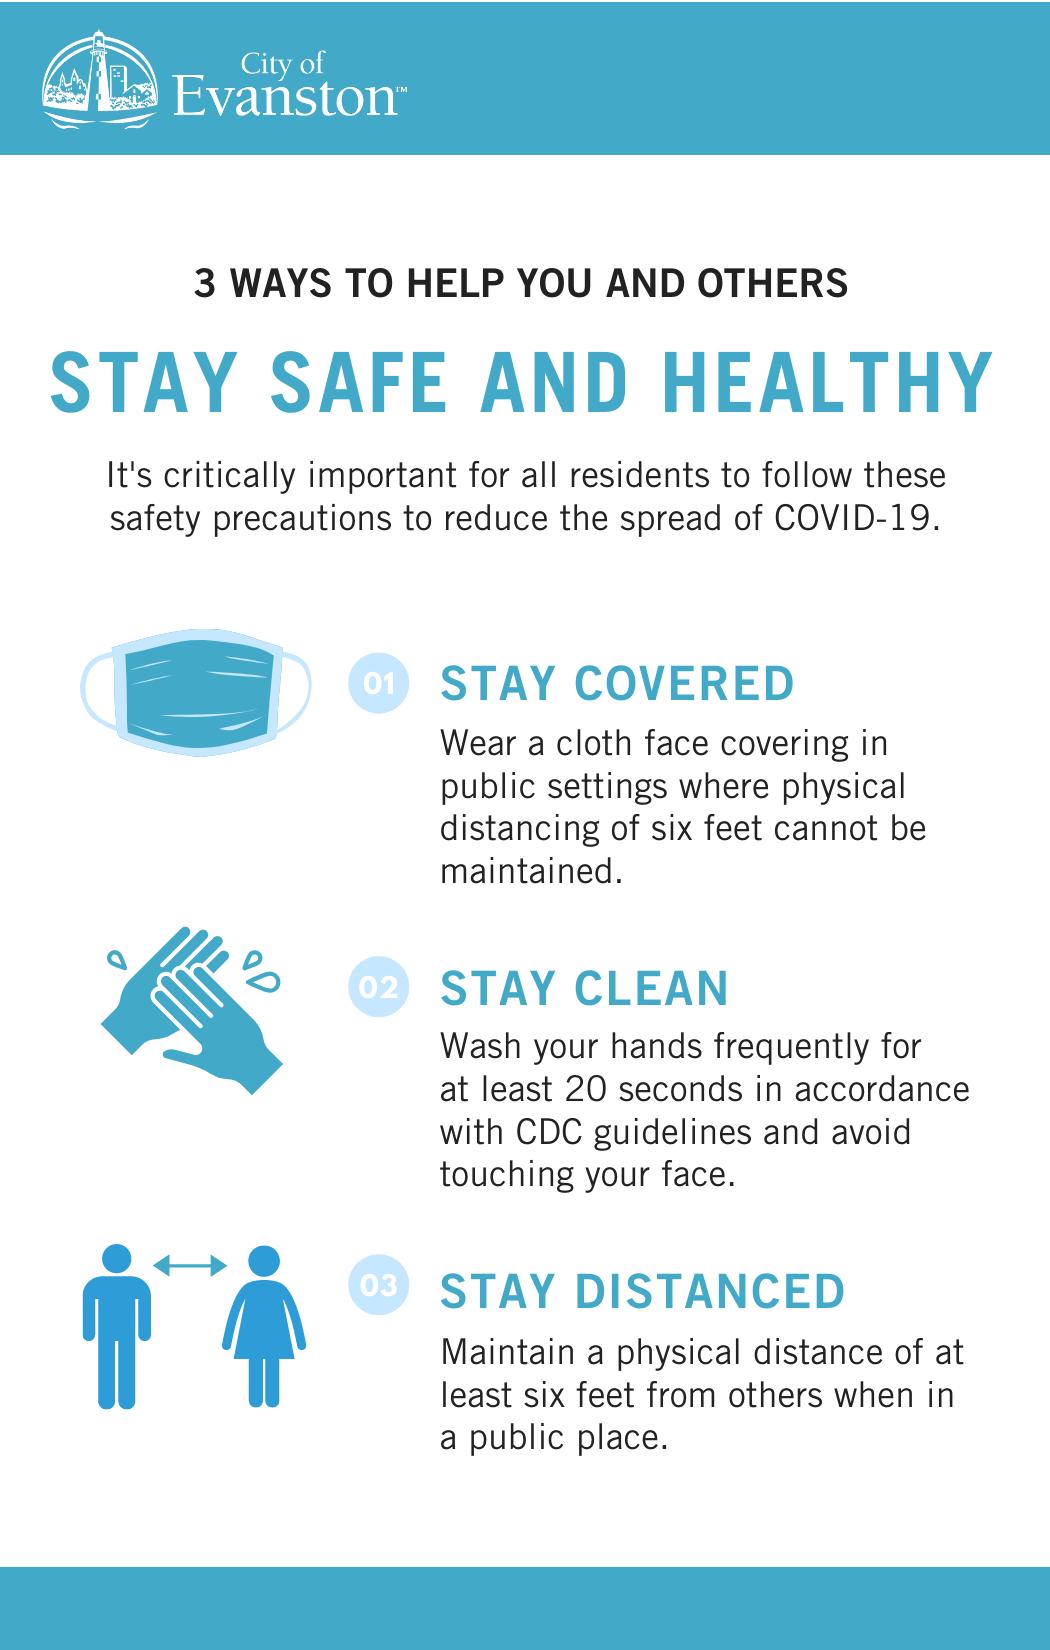 Three ways to stay safe COVID-19